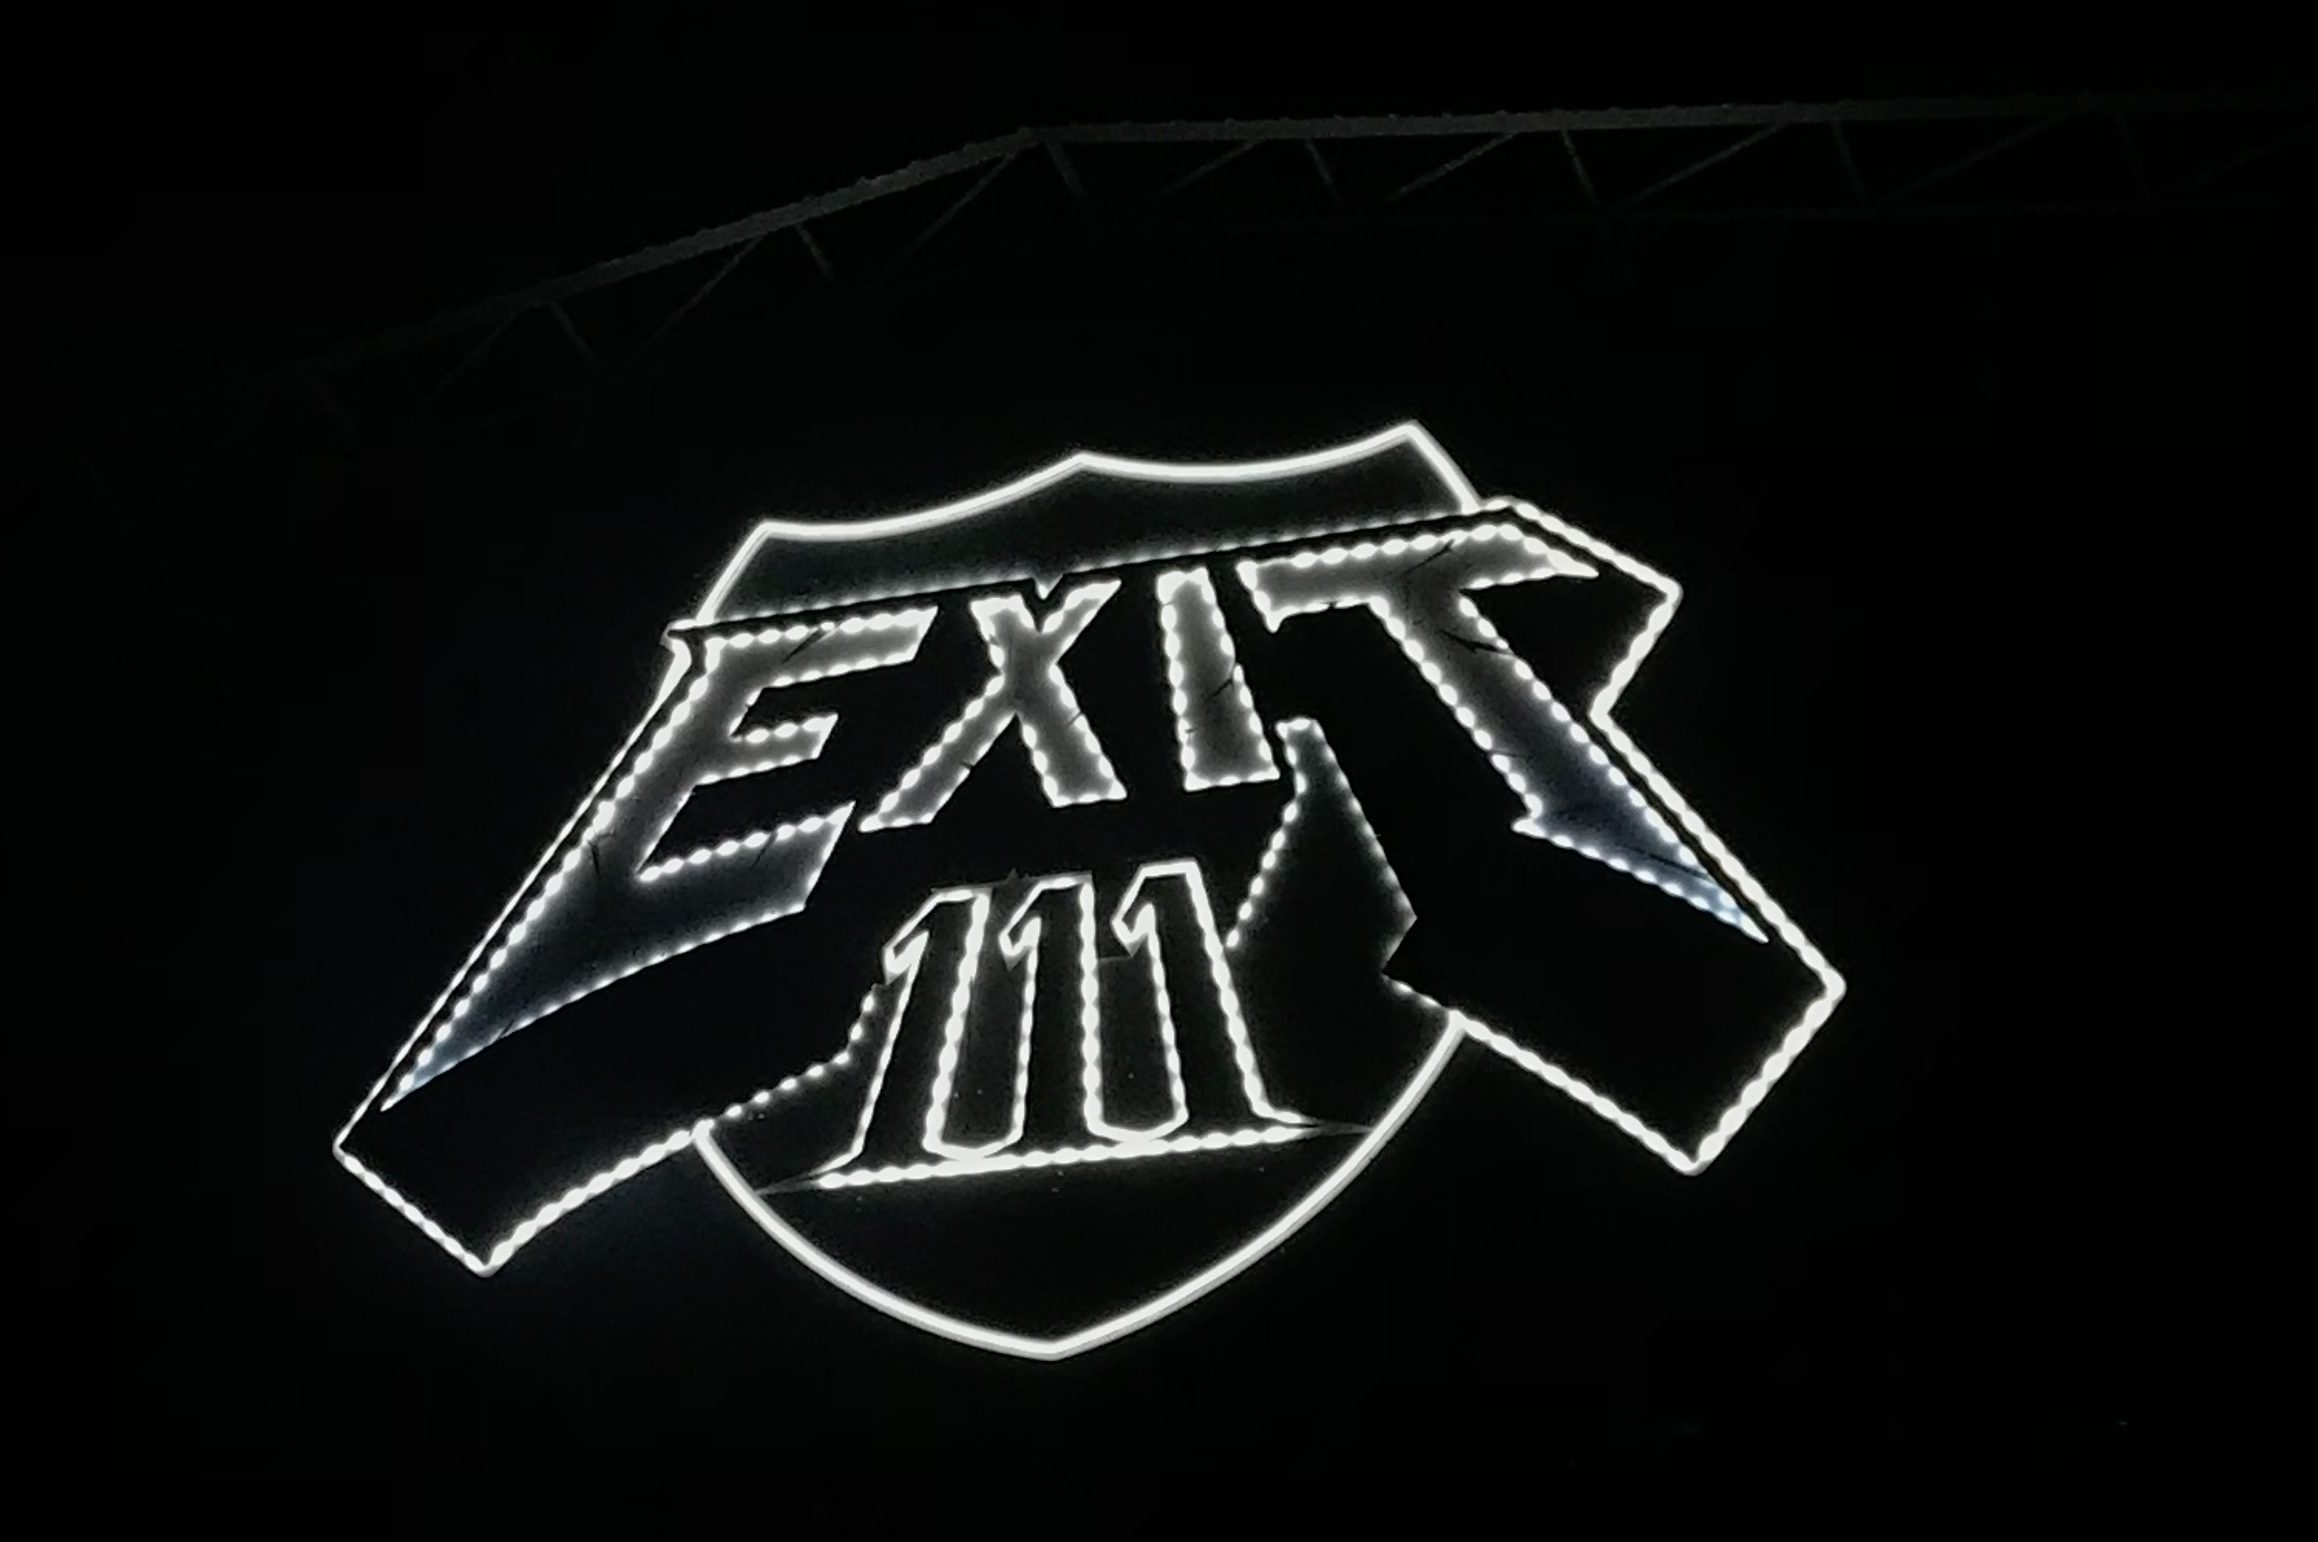 Exit 111 Lit up sign